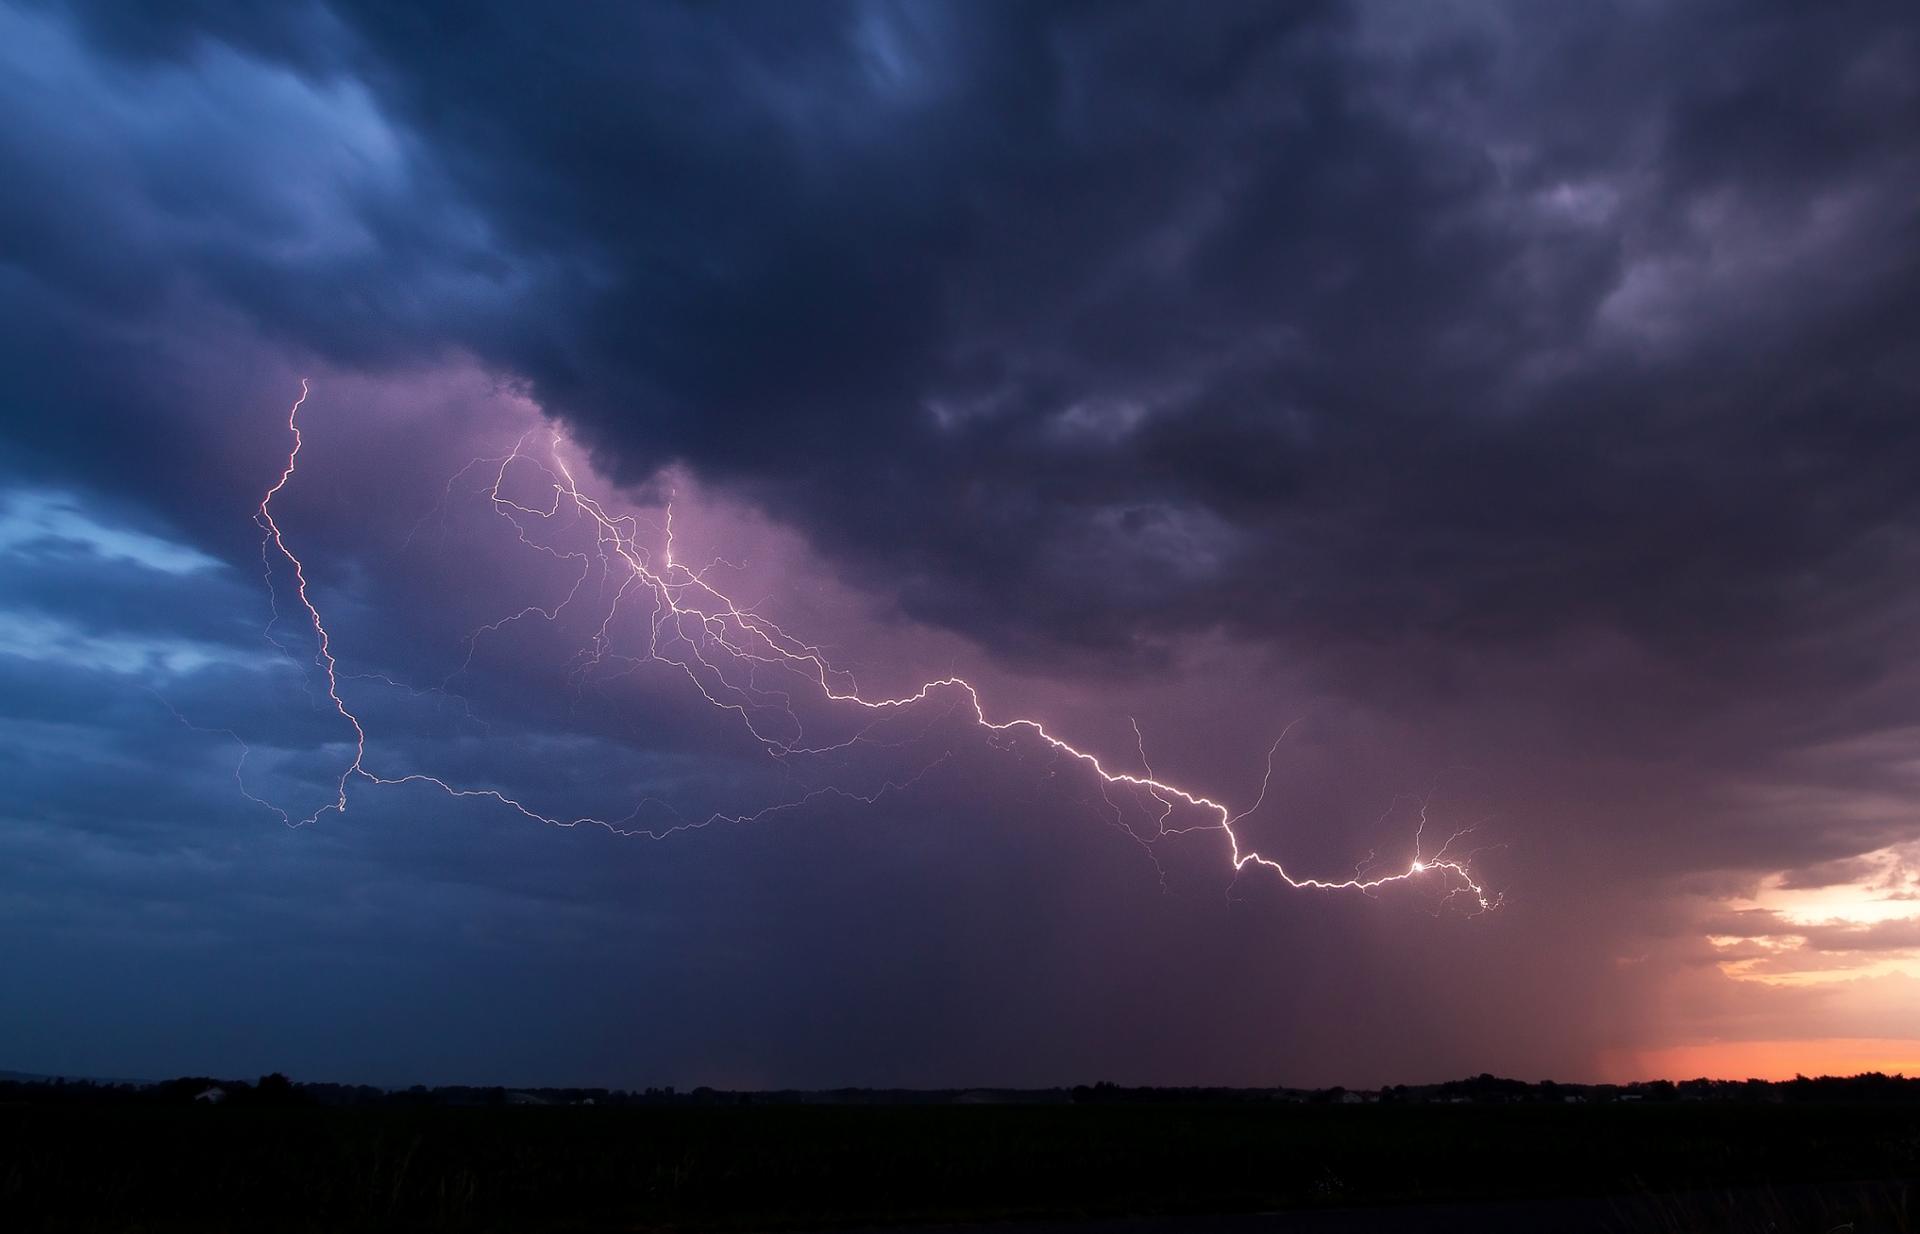 Lightning spirit